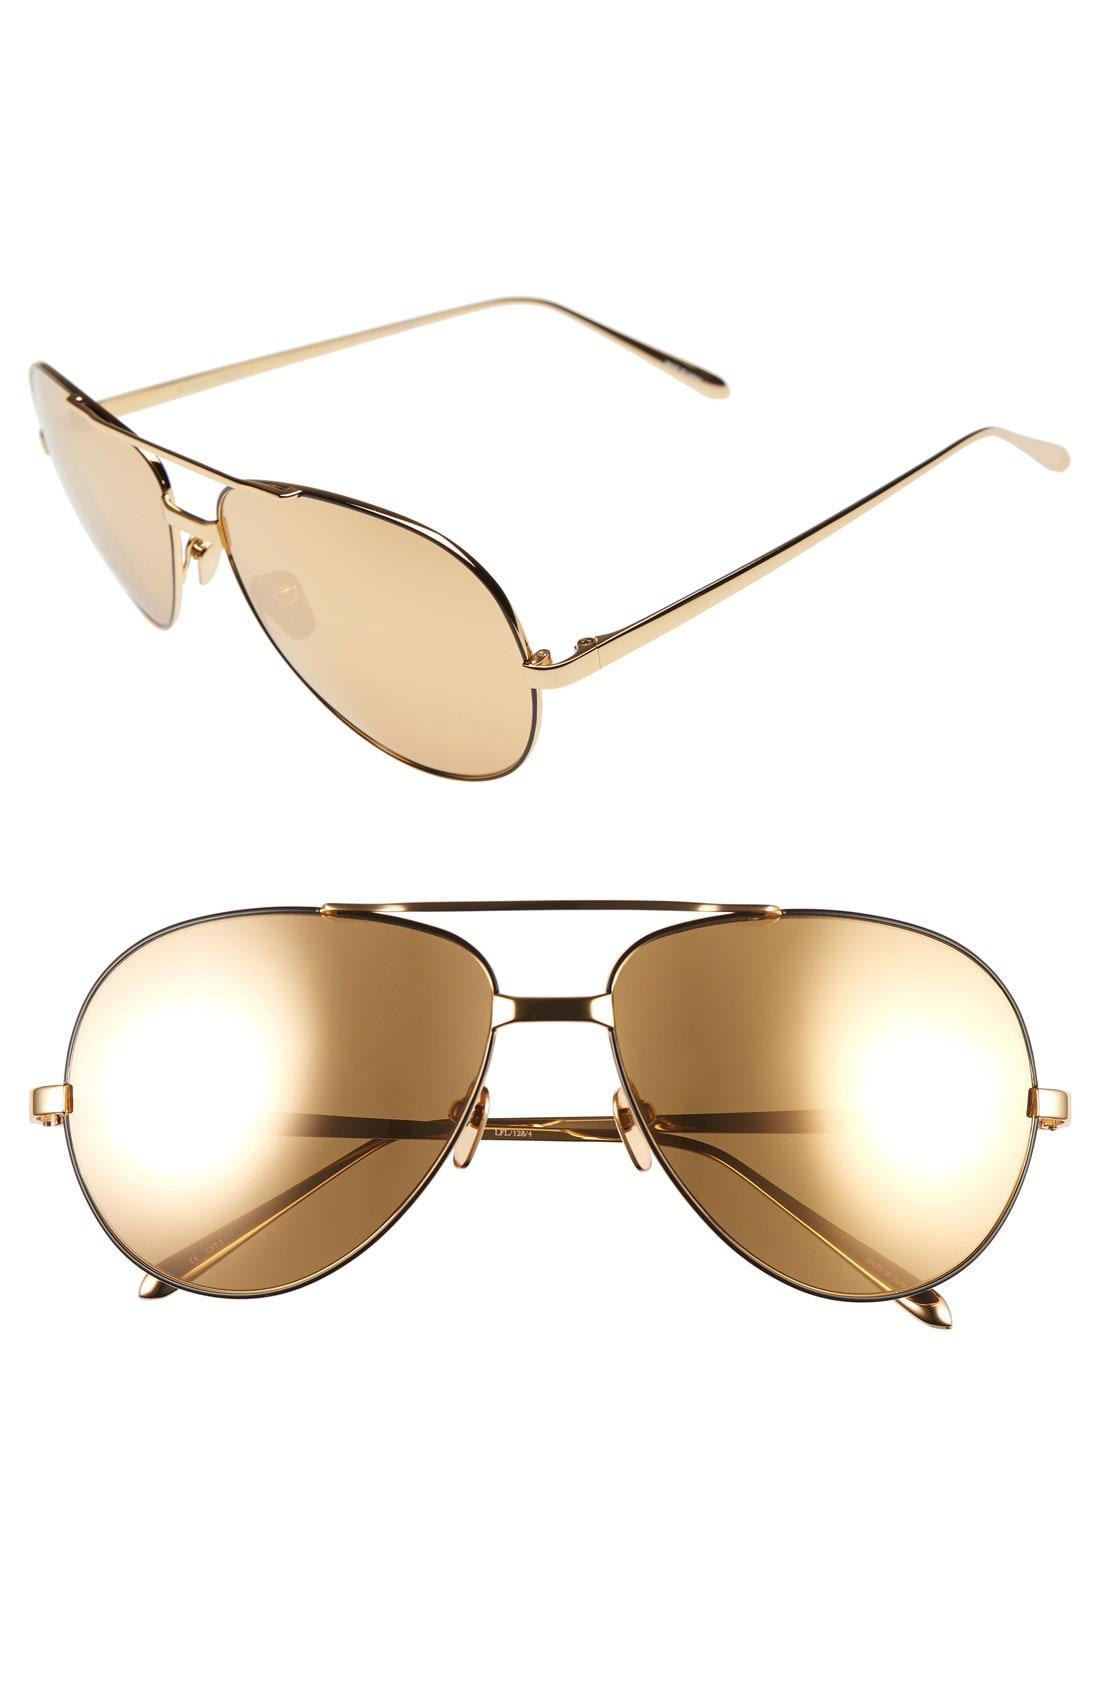 8900fbcc139 Linda Farrow. Women s Metallic 59mm 24 Karat Gold Trim Aviator Sunglasses -